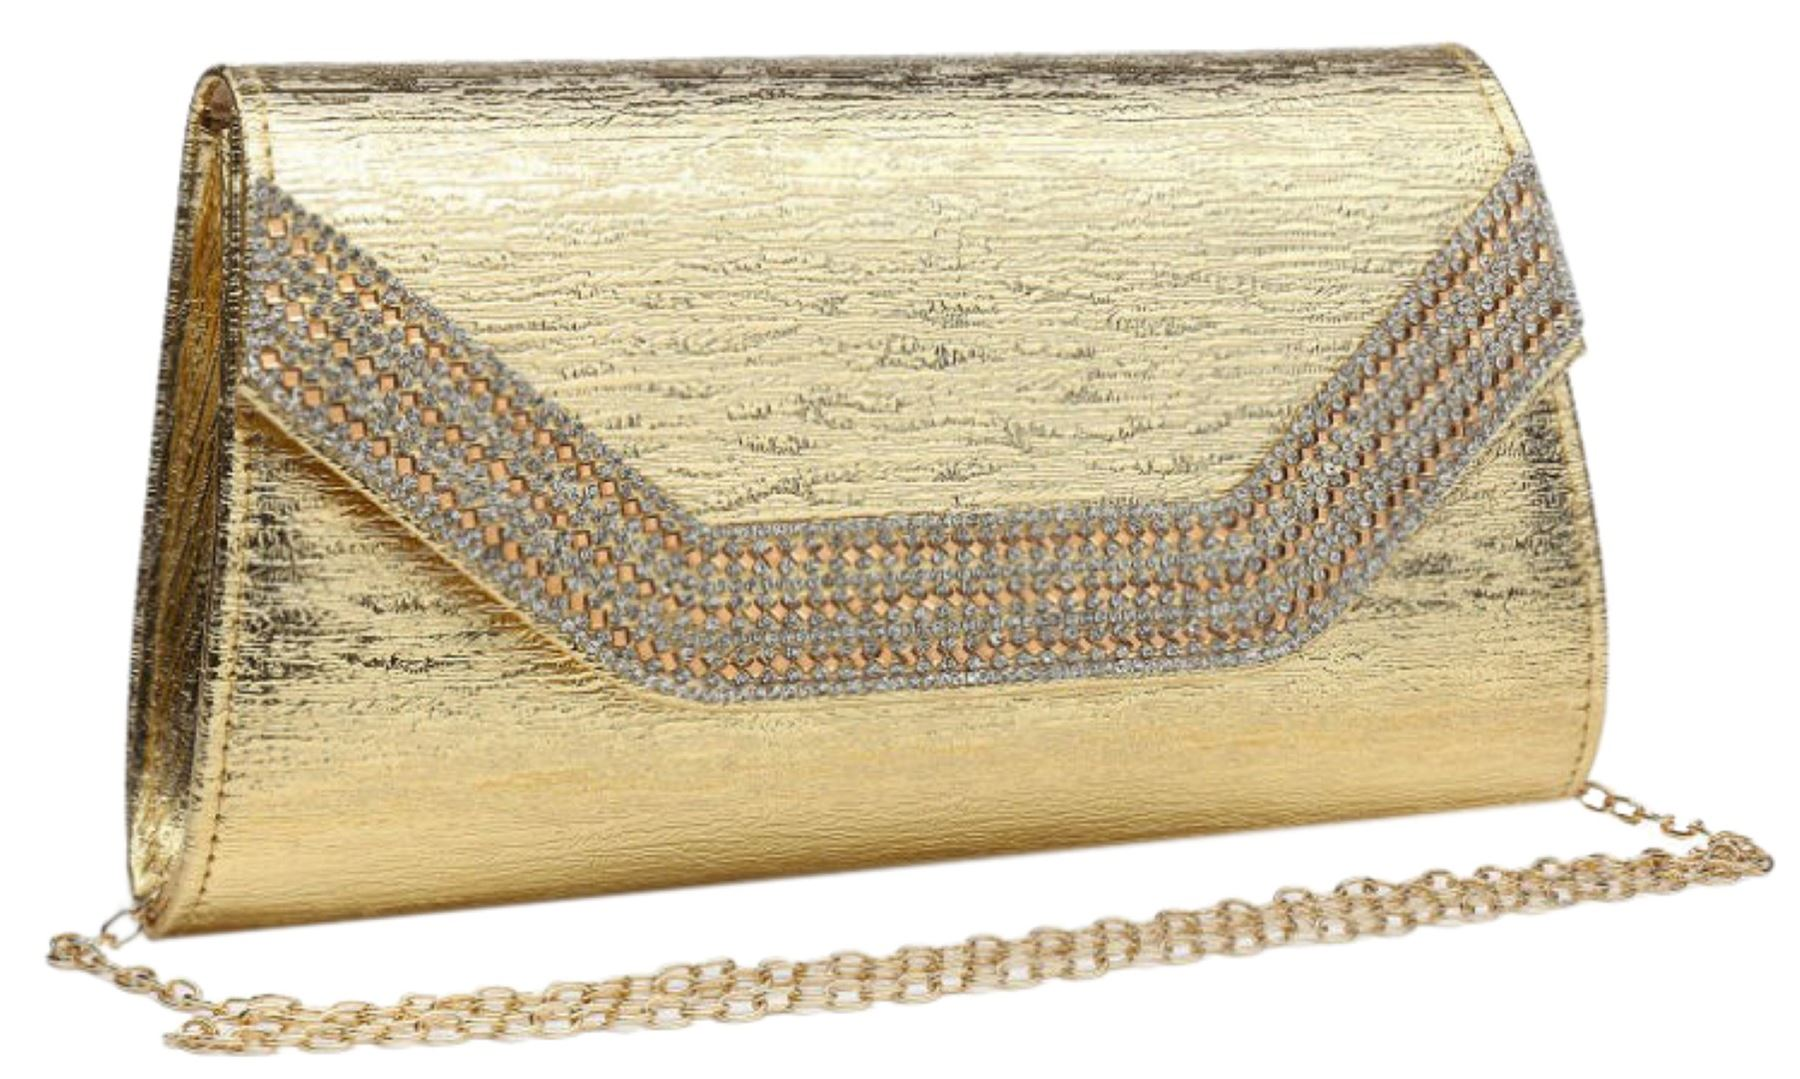 Preciosas Piedras Rosa Mano Solapa Bolso Diamante Estampado Oro Detalles De Elegante yn0vwOmN8